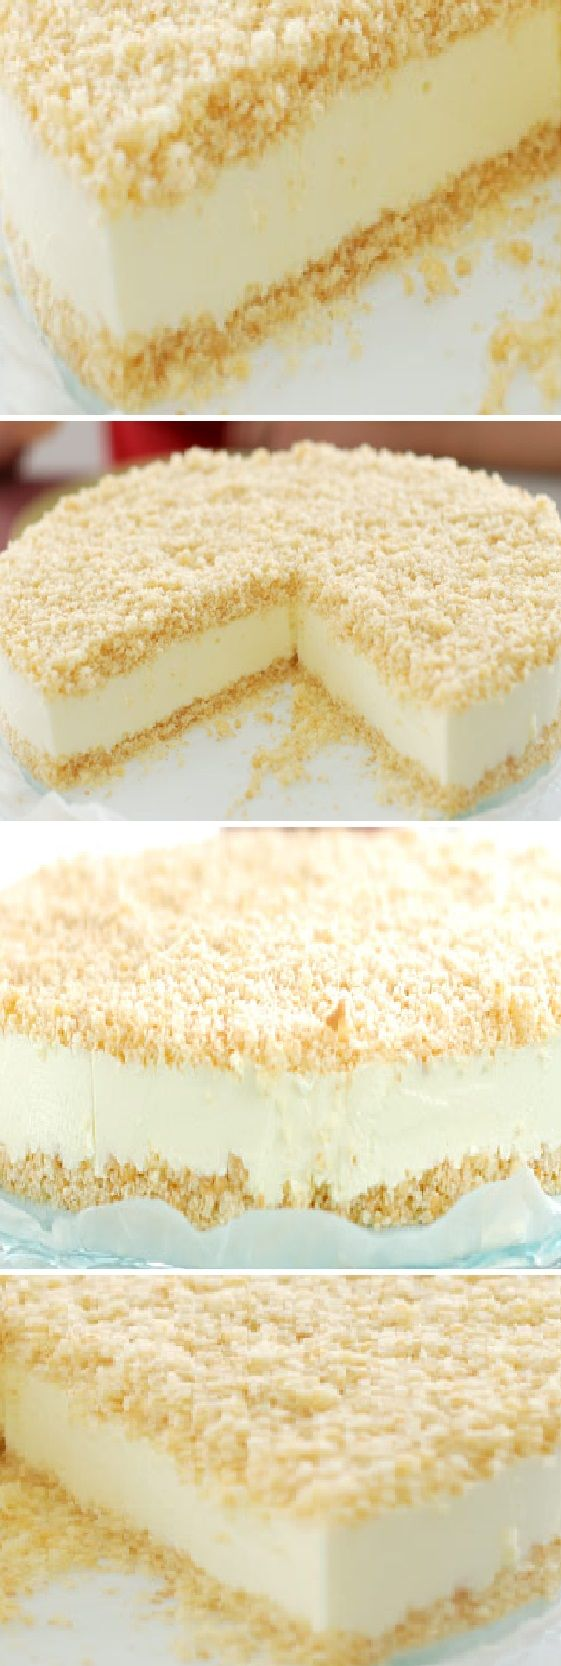 Esta receta tenéis que probarla sin falta, la mejor TARTA de LIMÓN SIN HORNO de mi vida.  #sinhorno #lamejor #limón  #cheesecake #postres #galletas #gelatina #quesophiladelphia #cake #gelato #receta #recipe #casero #torta #tartas #pastel #nestlecocina #bizcocho #bizcochuelo #tasty #cocina #chocolate   Si te gusta dinos HOLA y dale a Me Gusta MIREN…